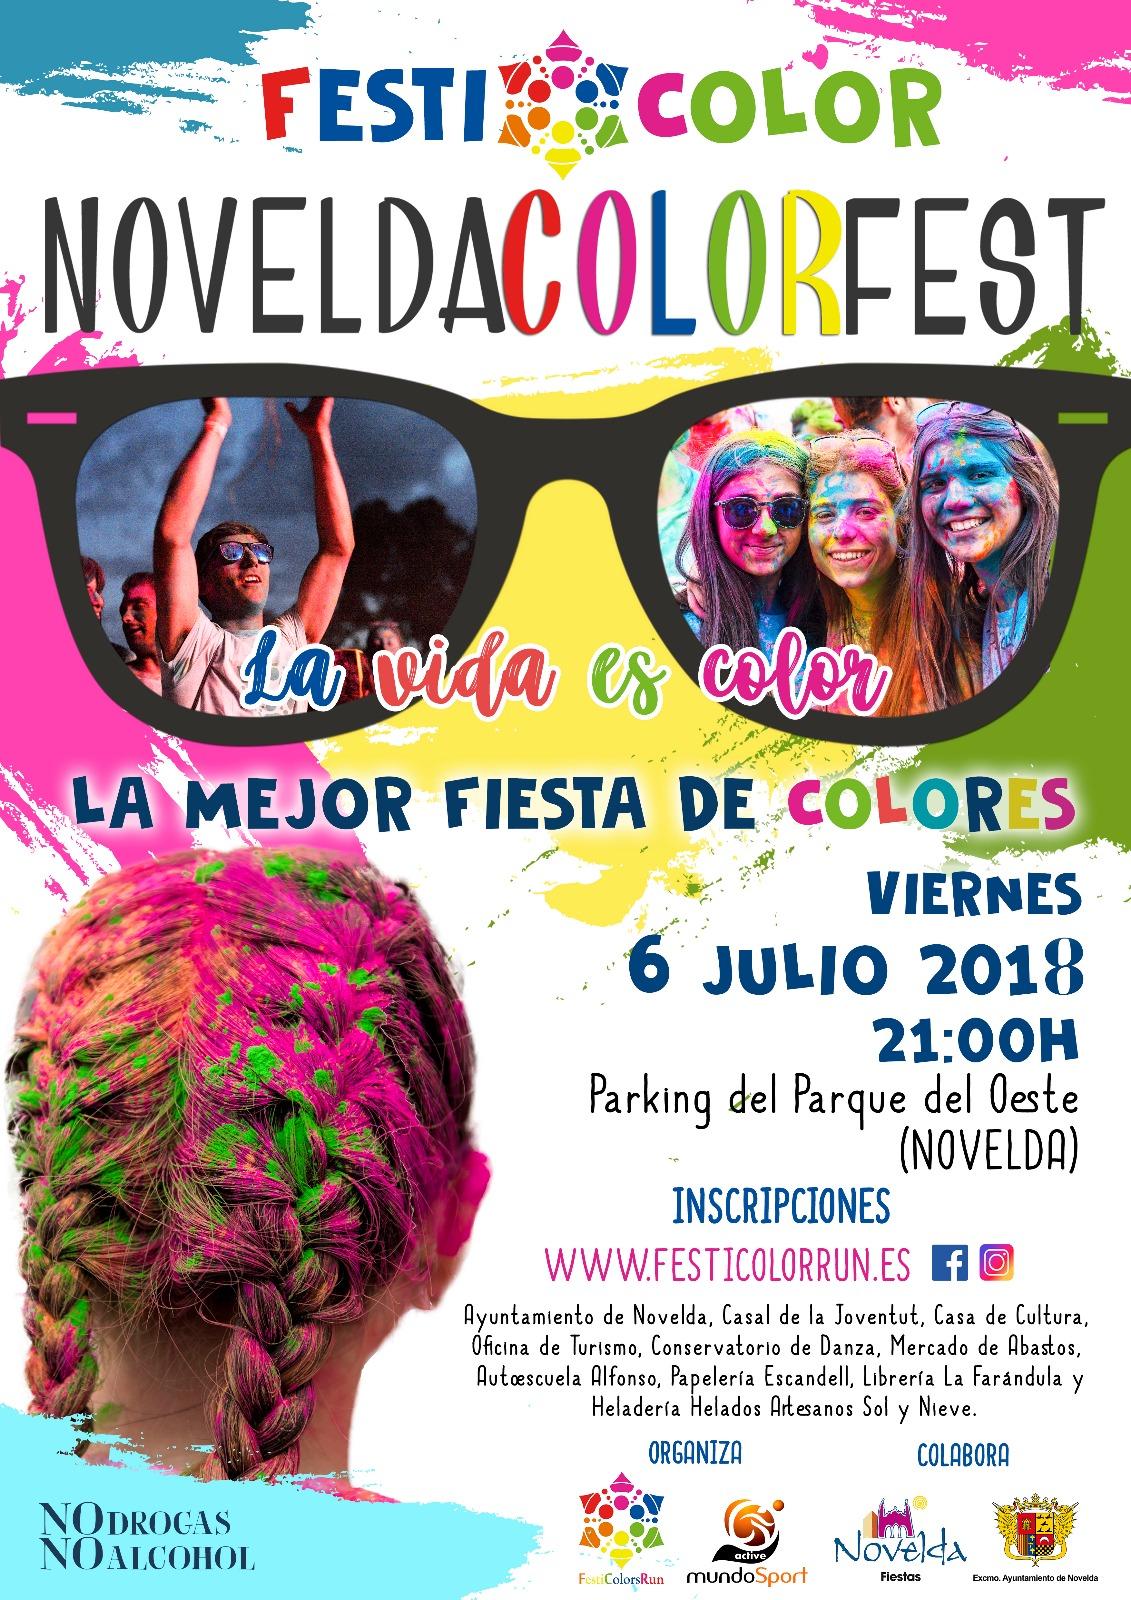 Festi colors